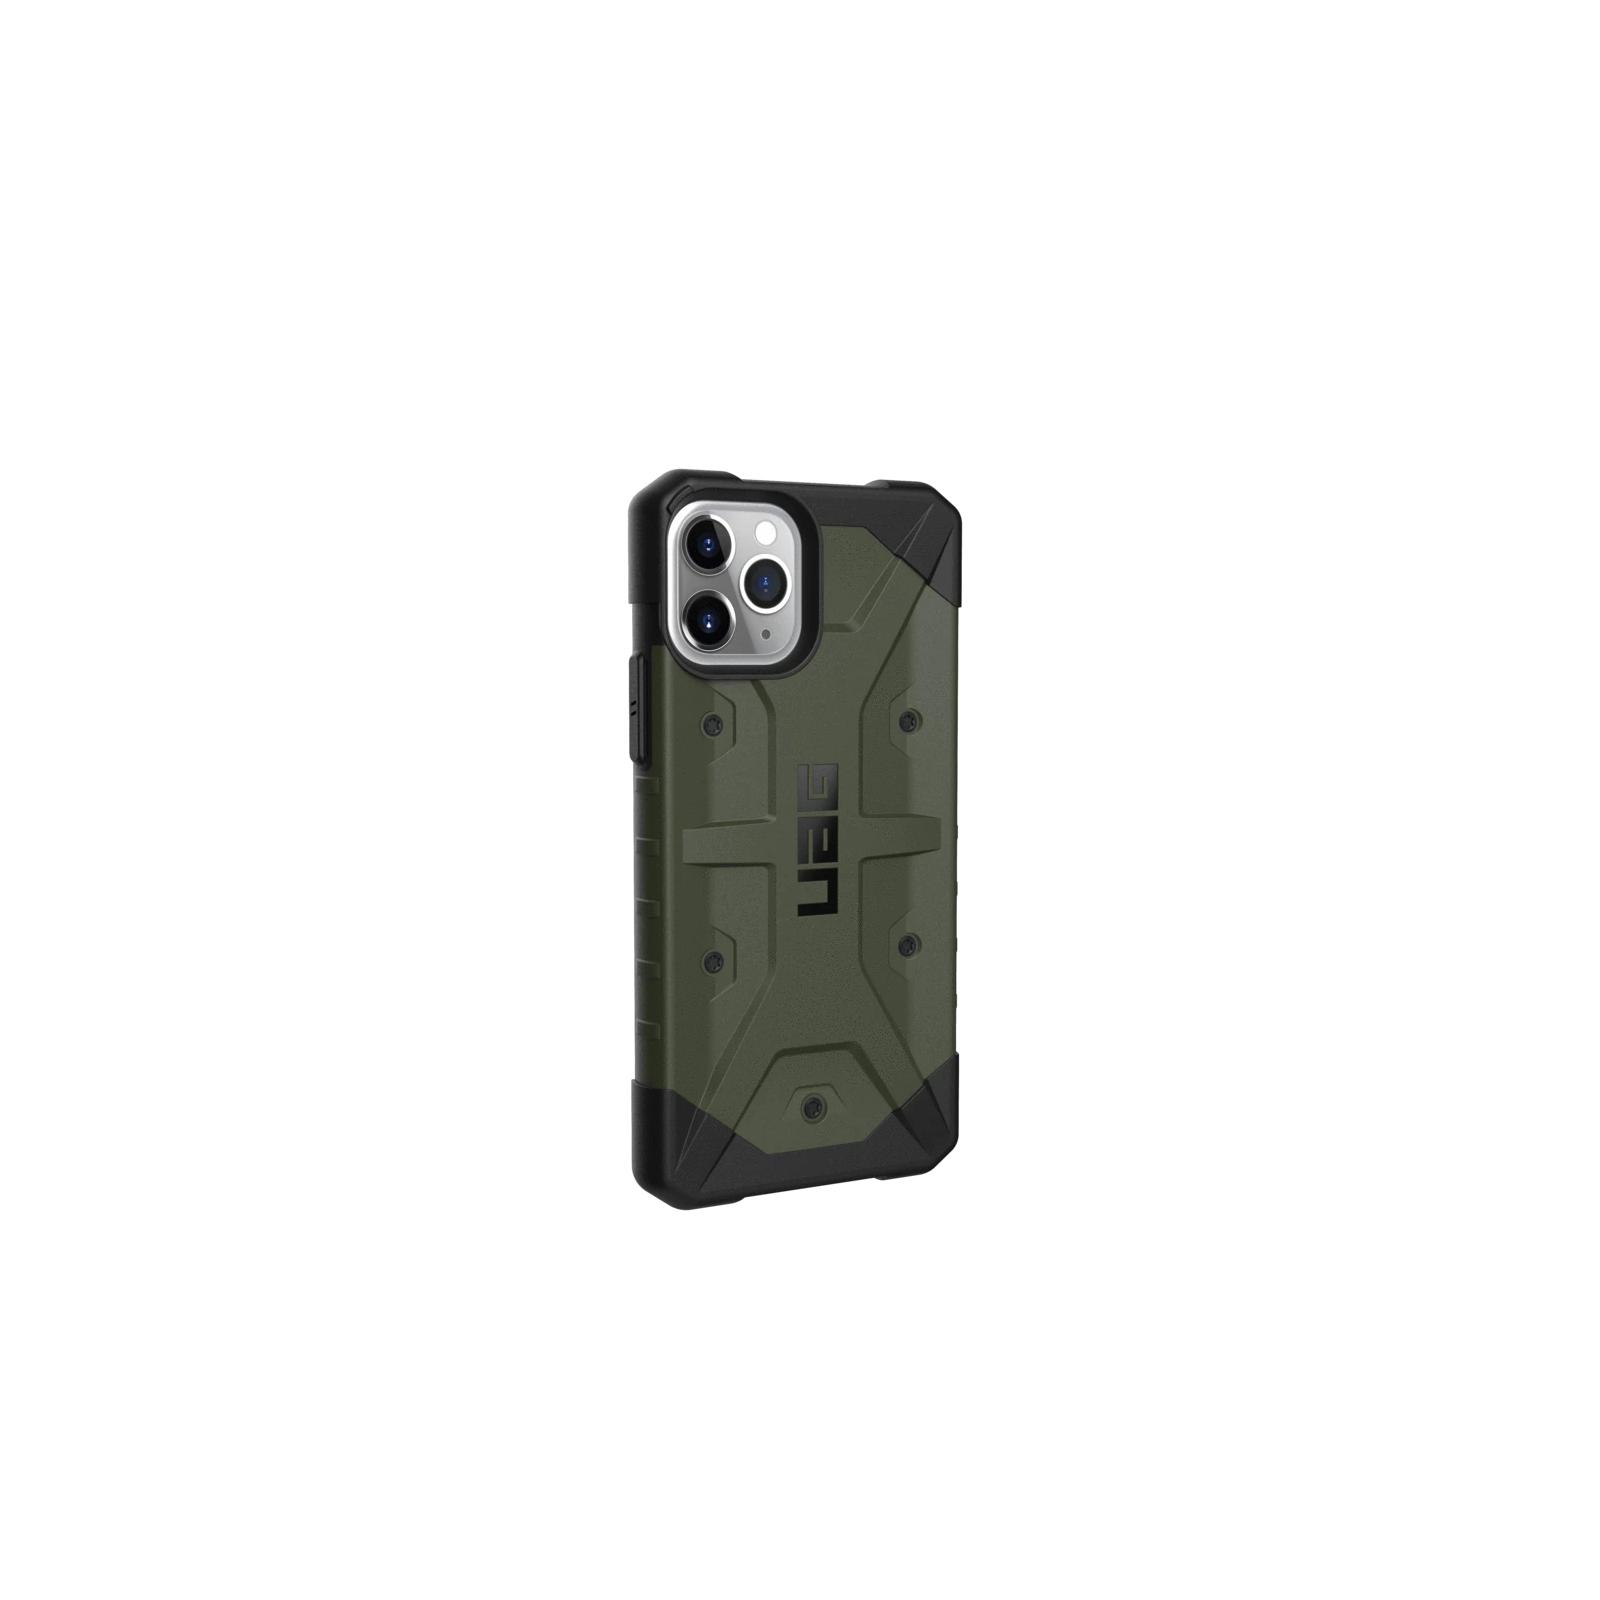 Чехол для моб. телефона Uag iPhone 11 Pro Pathfinder, White (111707114141) изображение 3